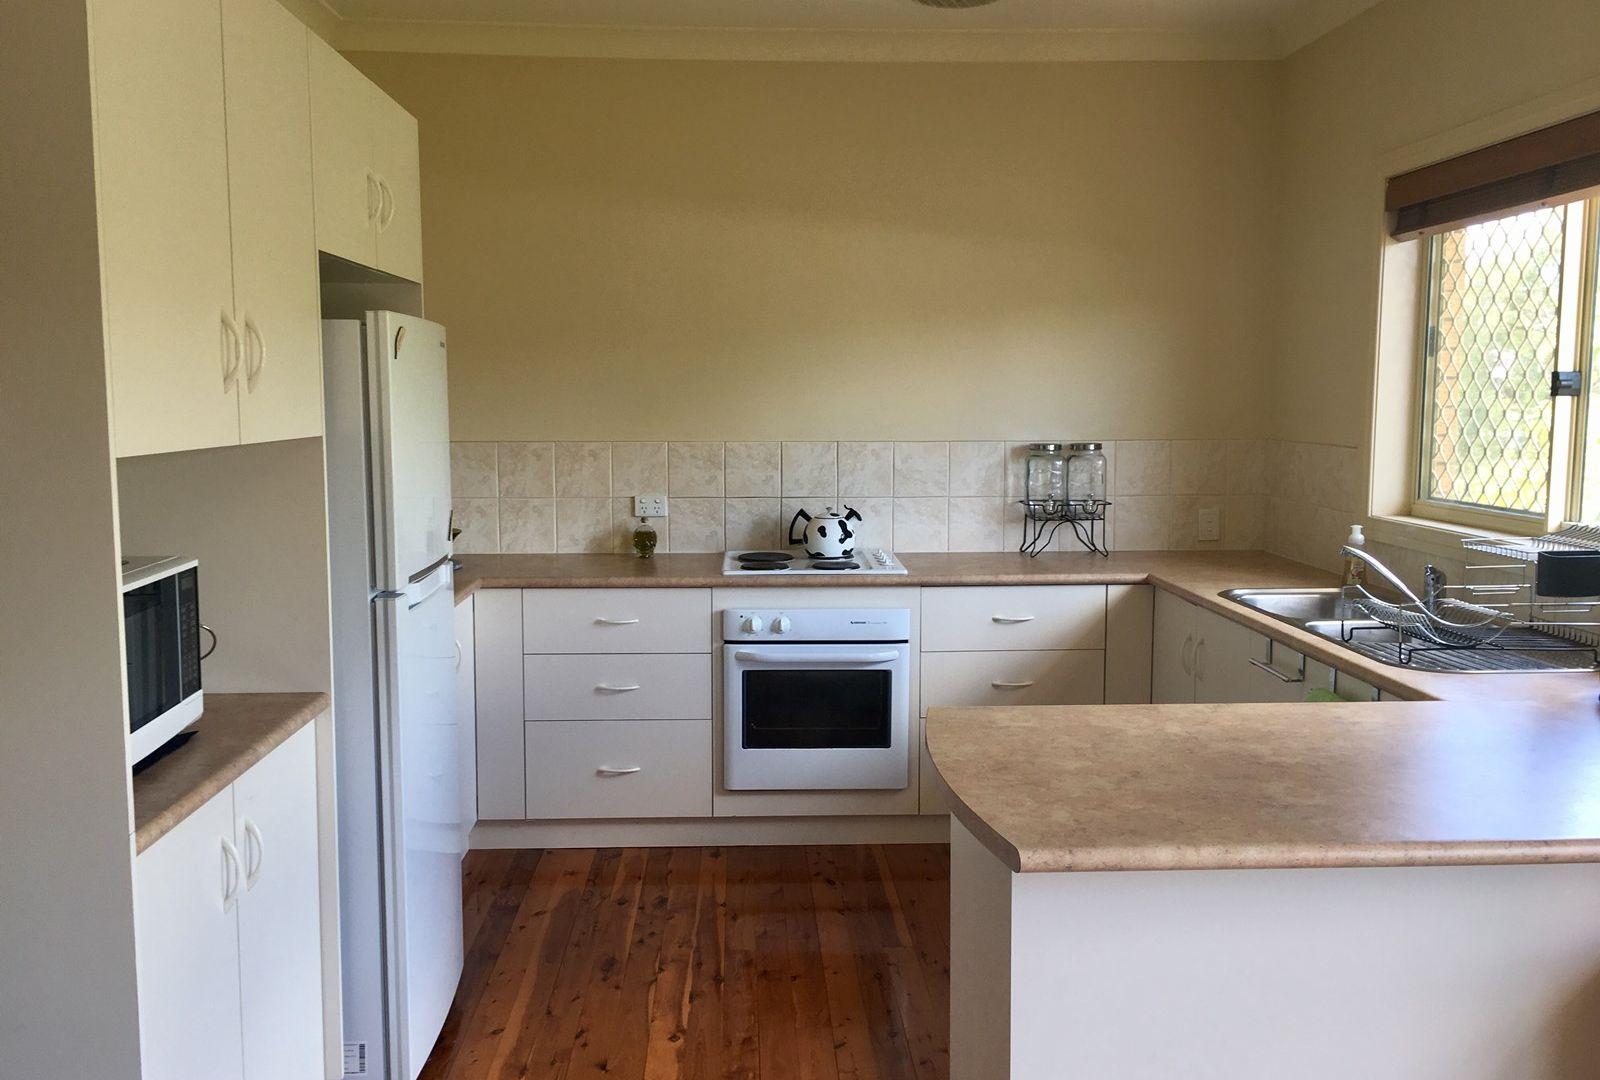 4/408 Schubach Street, Albury NSW 2640, Image 1